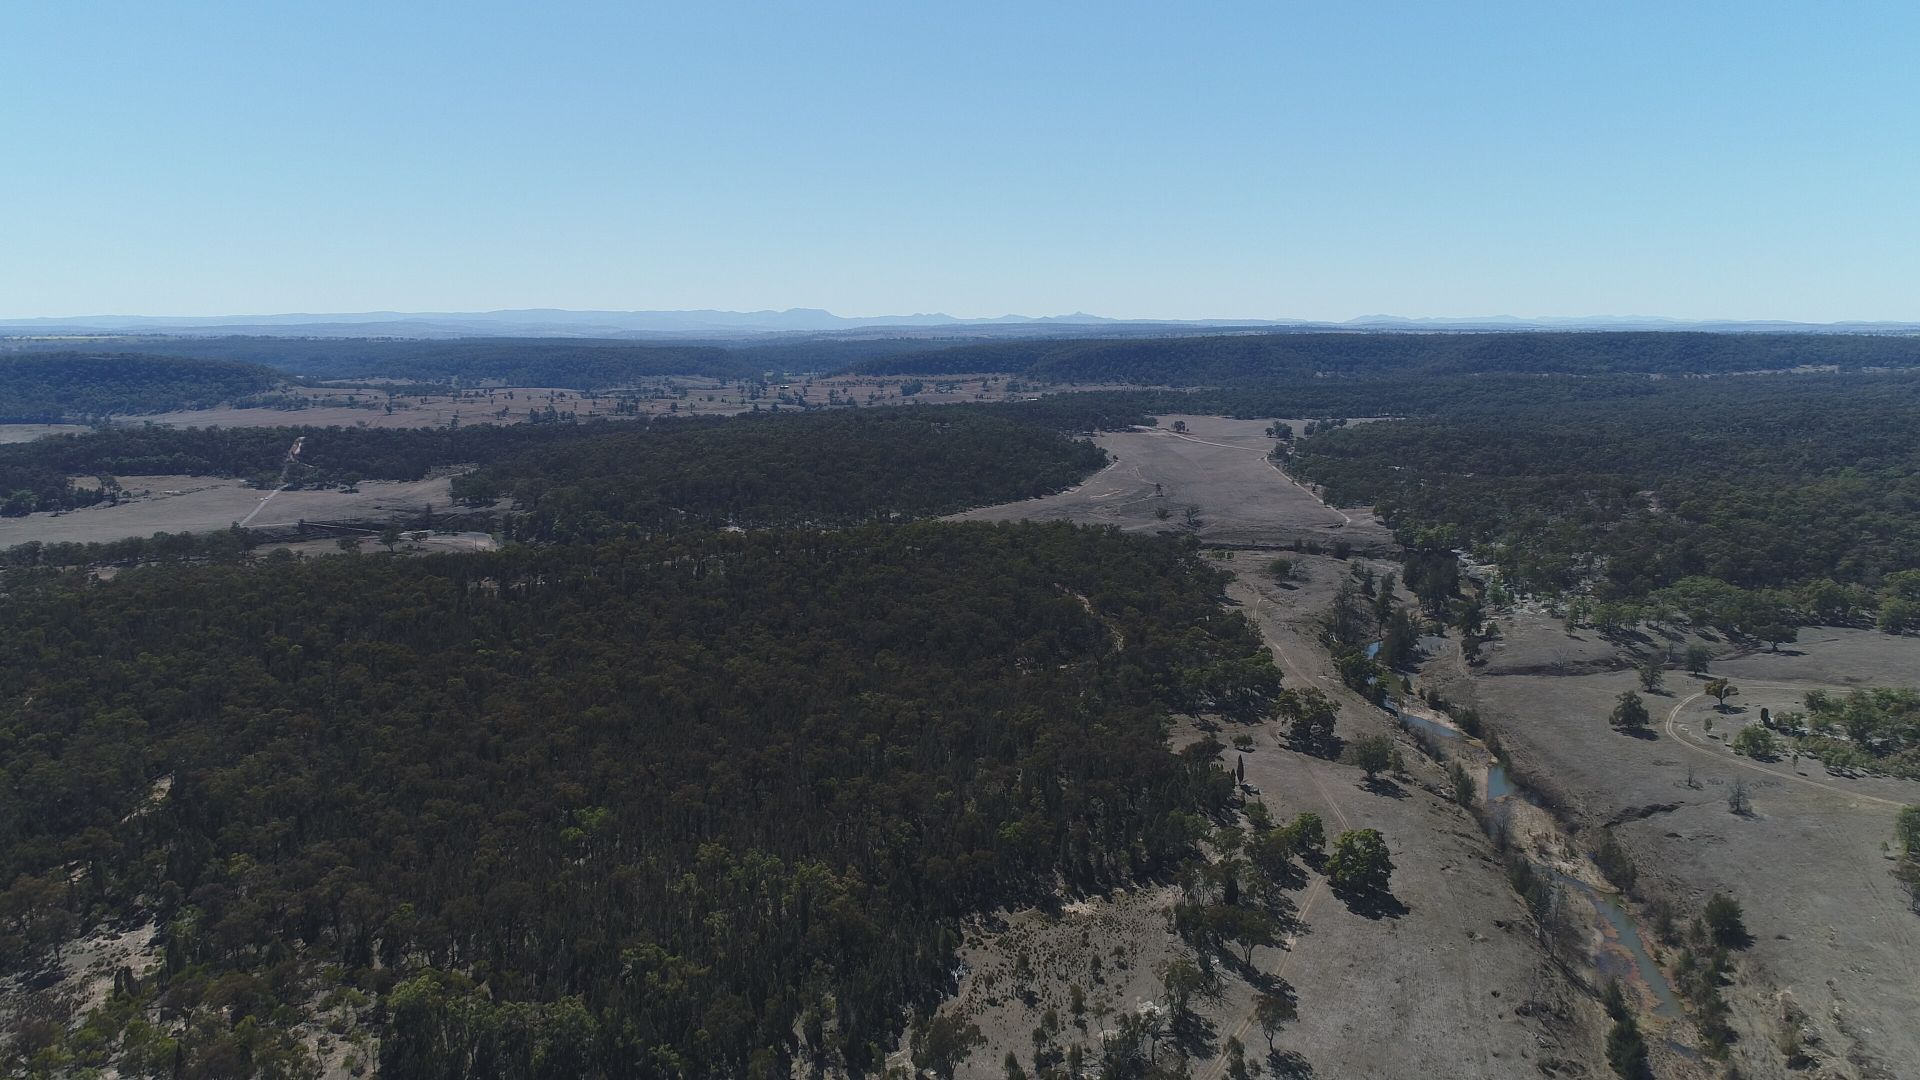 Lot 59 via HULKS ROAD, Merriwa NSW 2329, Image 1